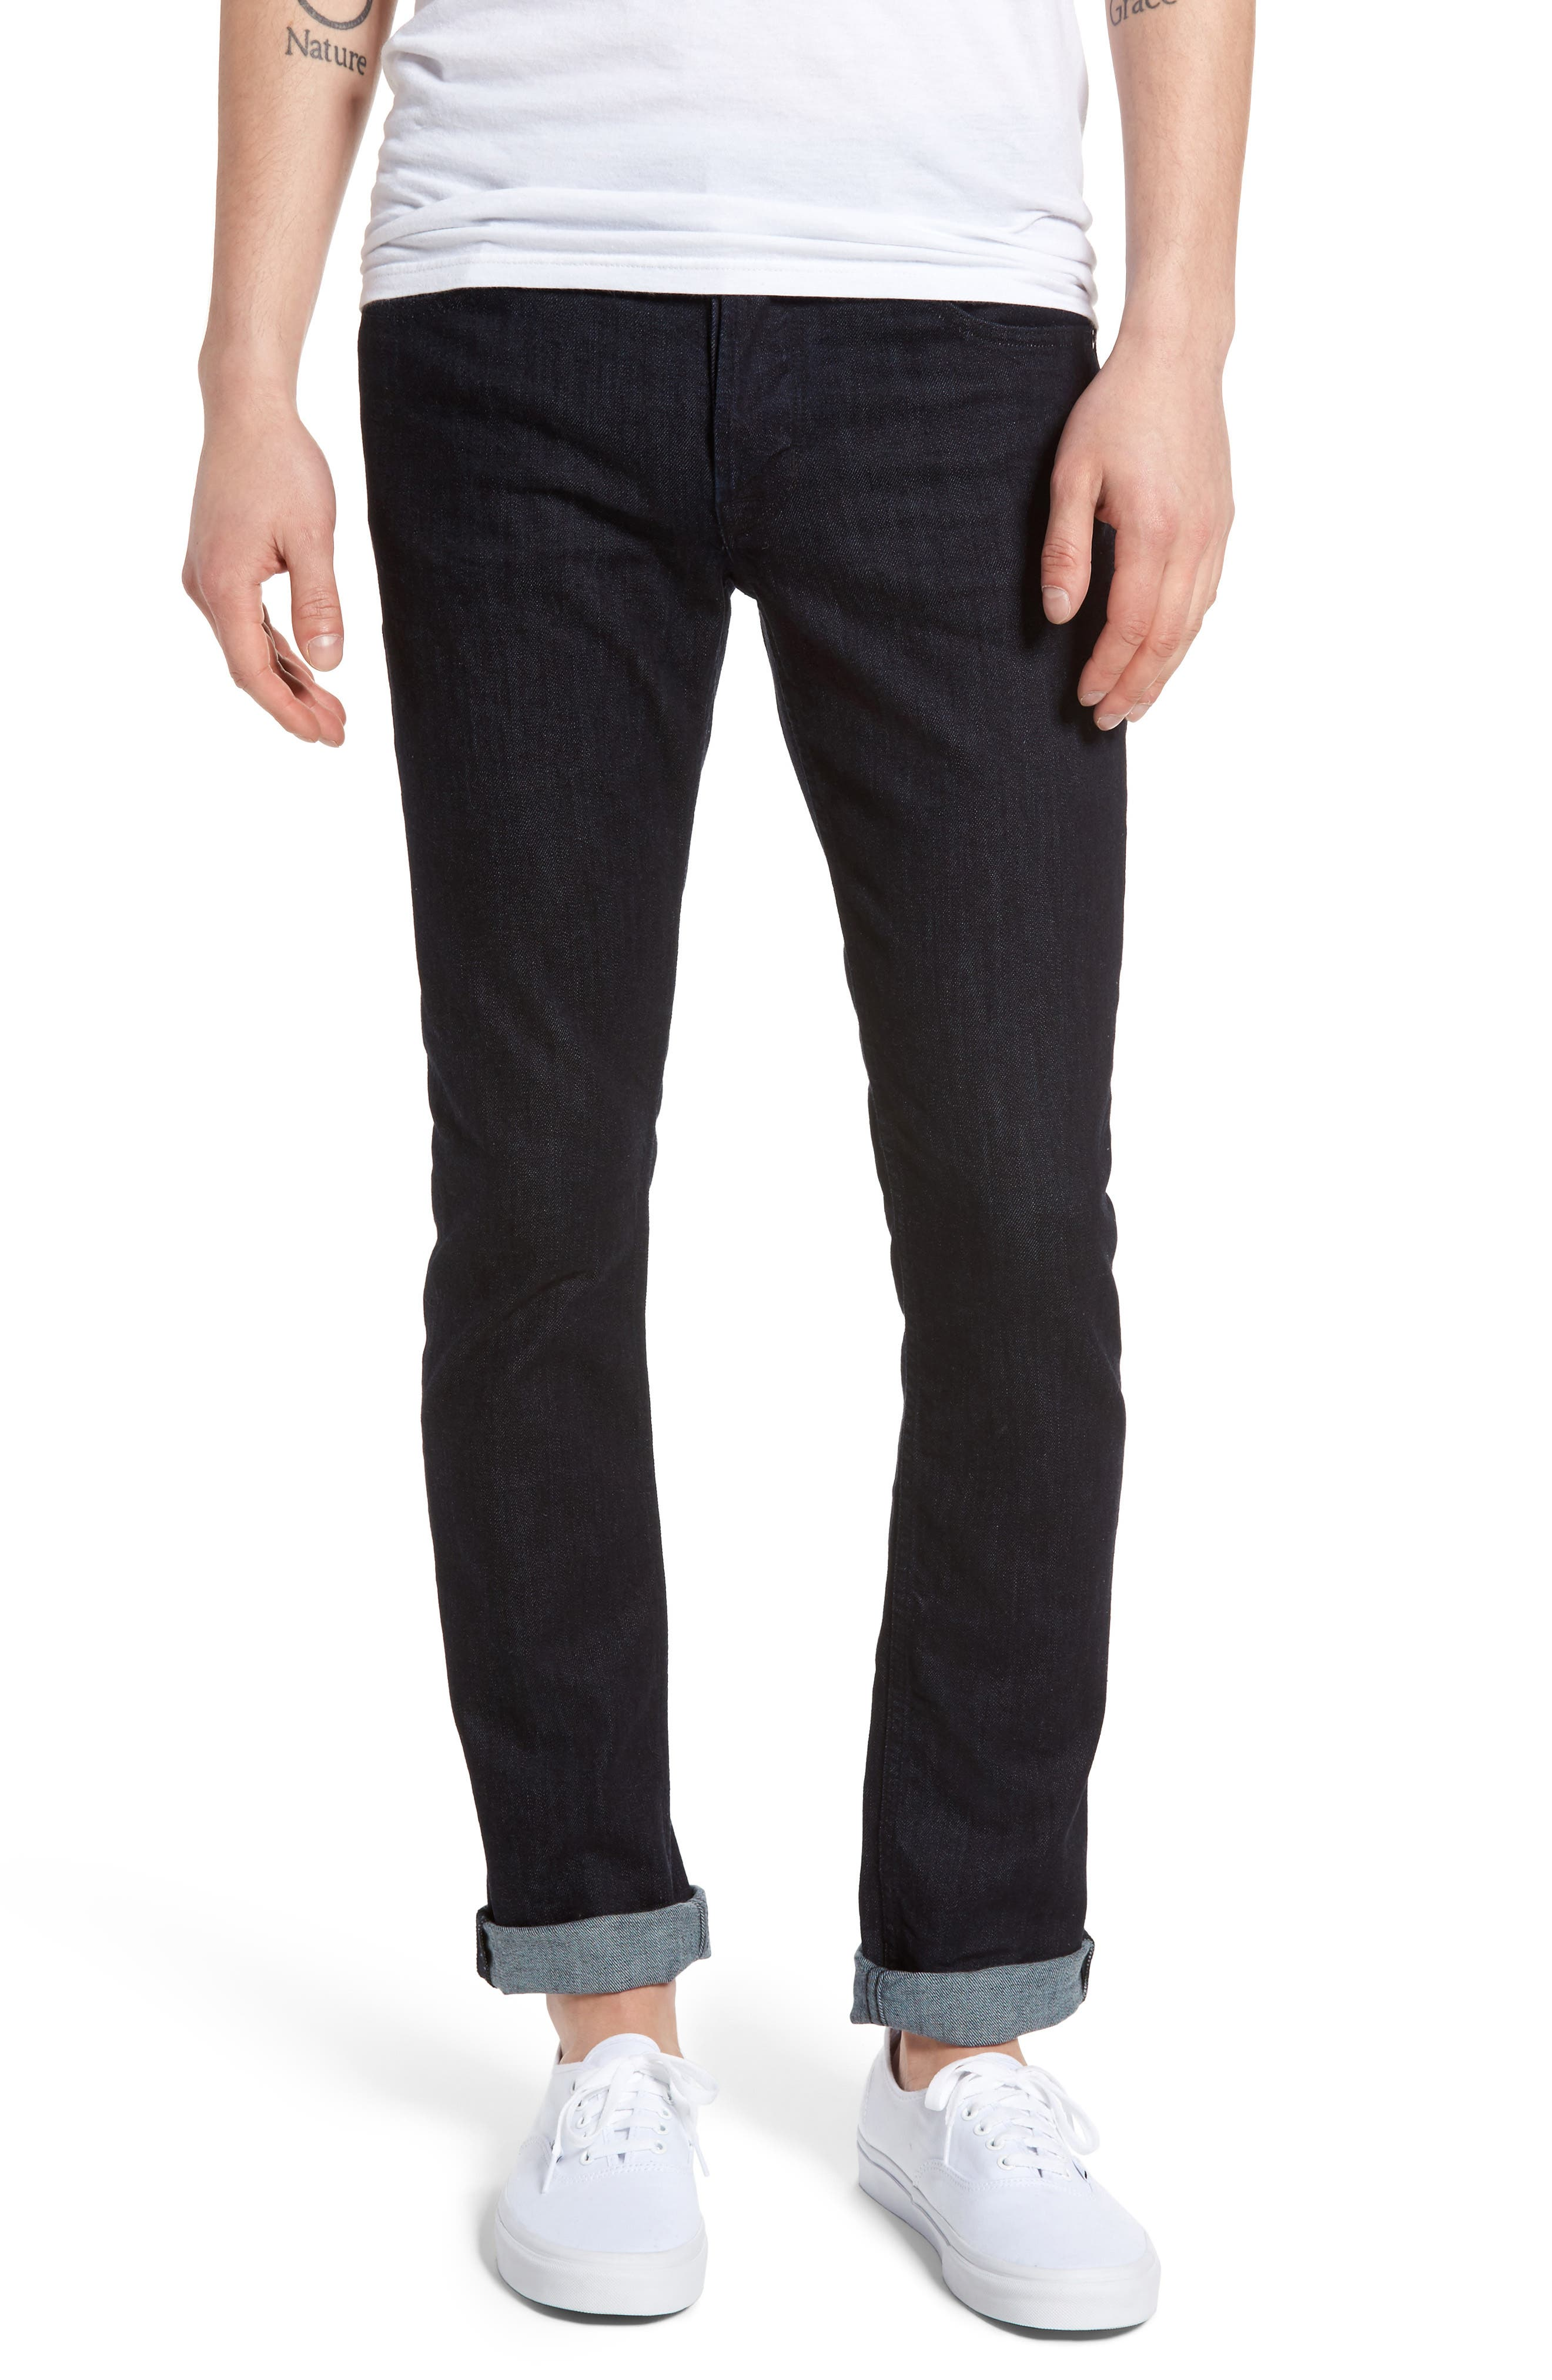 Axl Skinny Fit Jeans,                         Main,                         color, Firestone